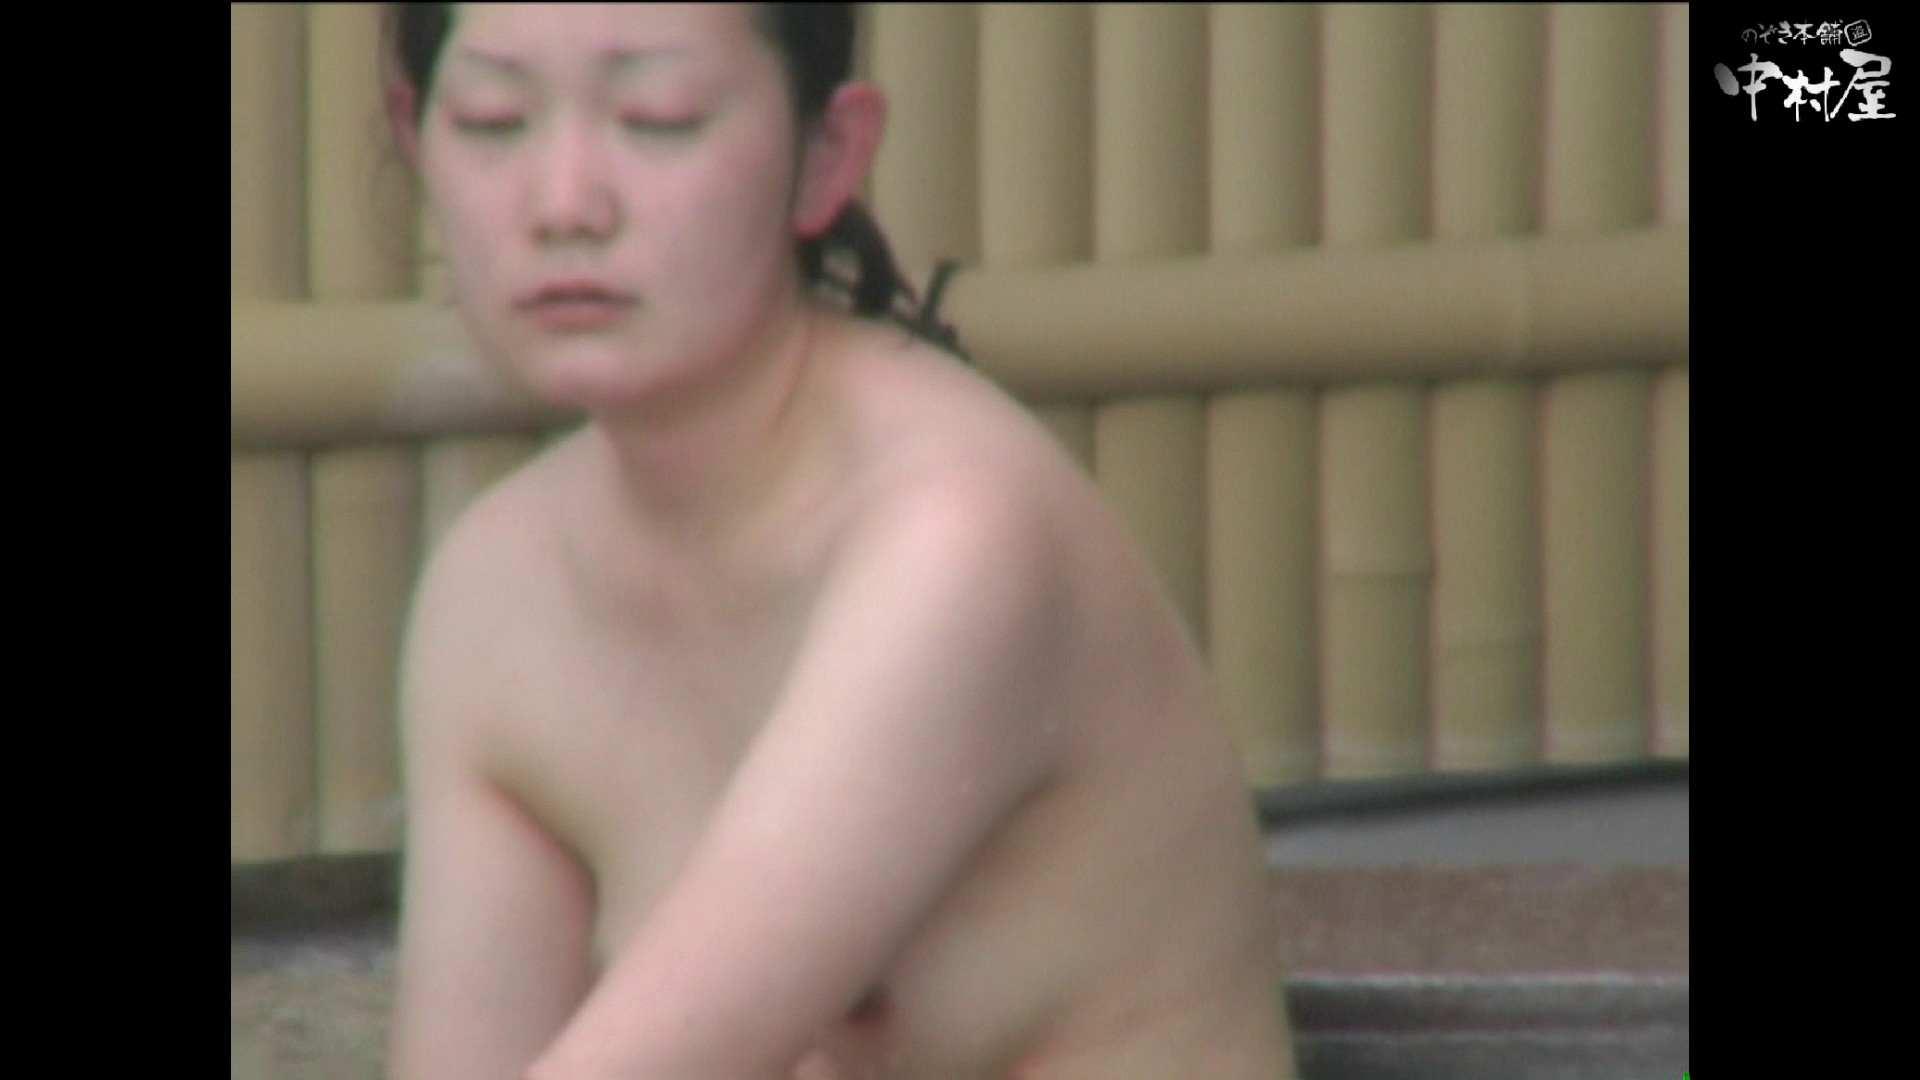 Aquaな露天風呂Vol.892 盗撮特撮 オメコ無修正動画無料 12pic 8